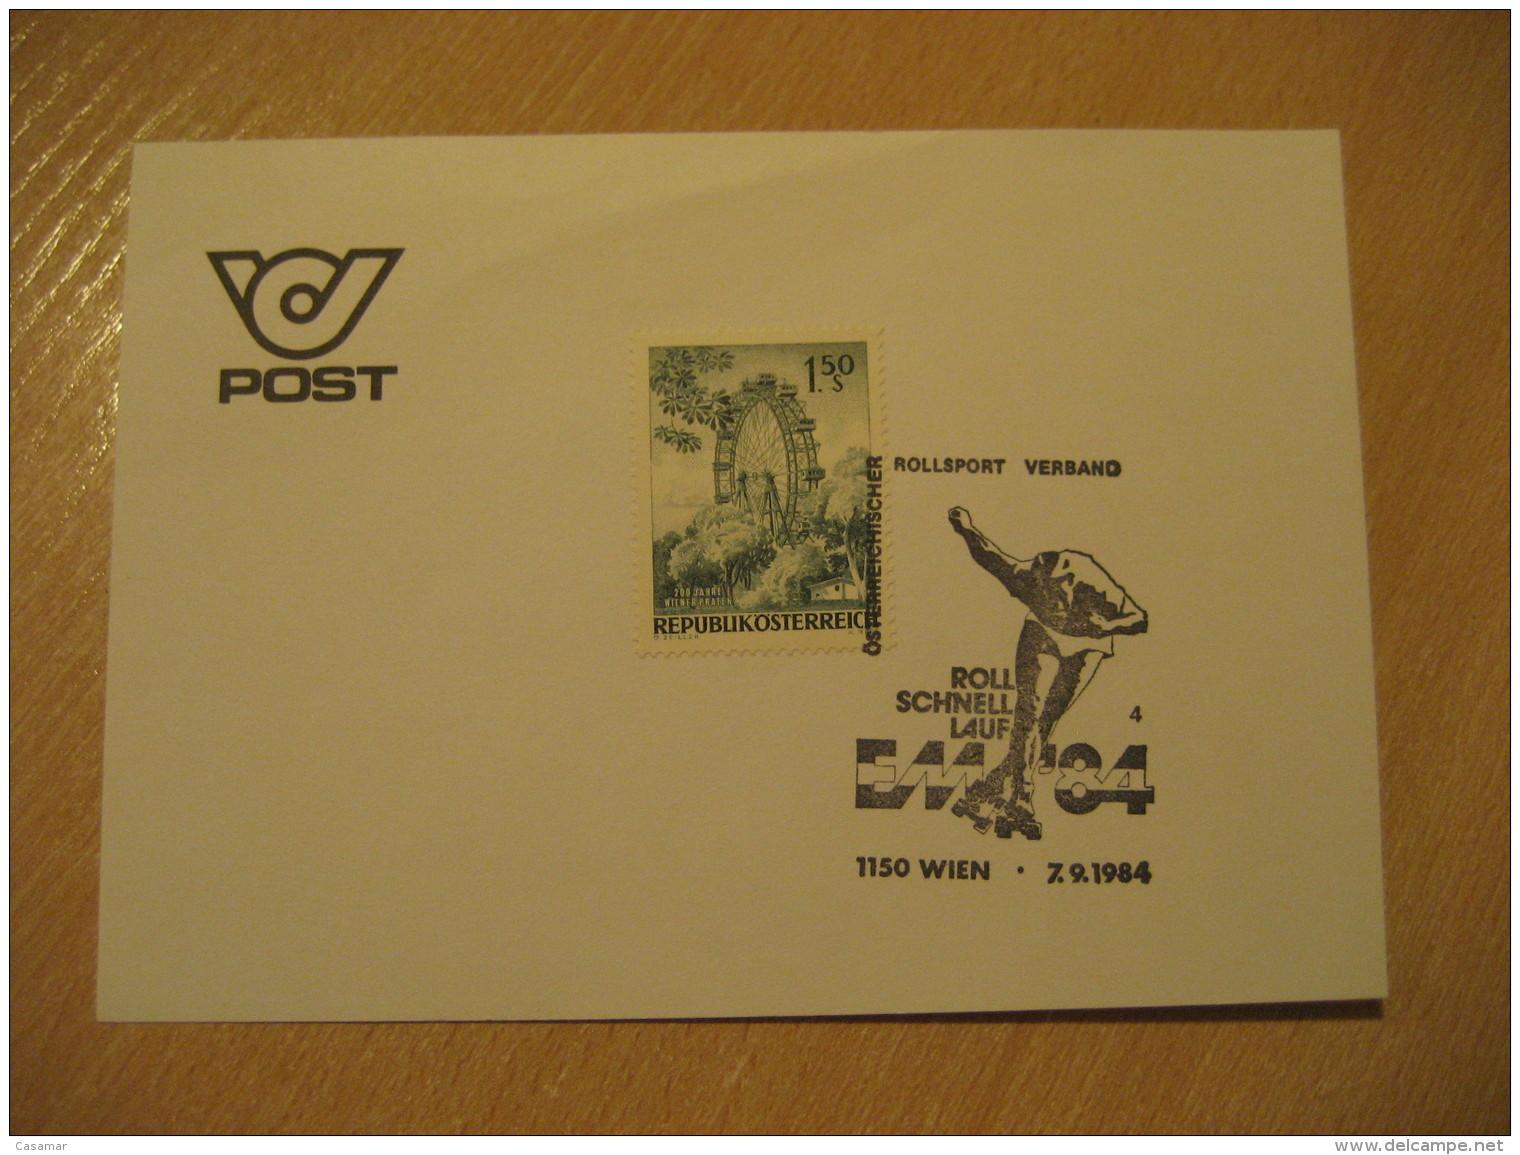 WIEN 1984 Rollsport Verband Skateboard Skating Patinage Cancel Card AUSTRIA - Skateboard